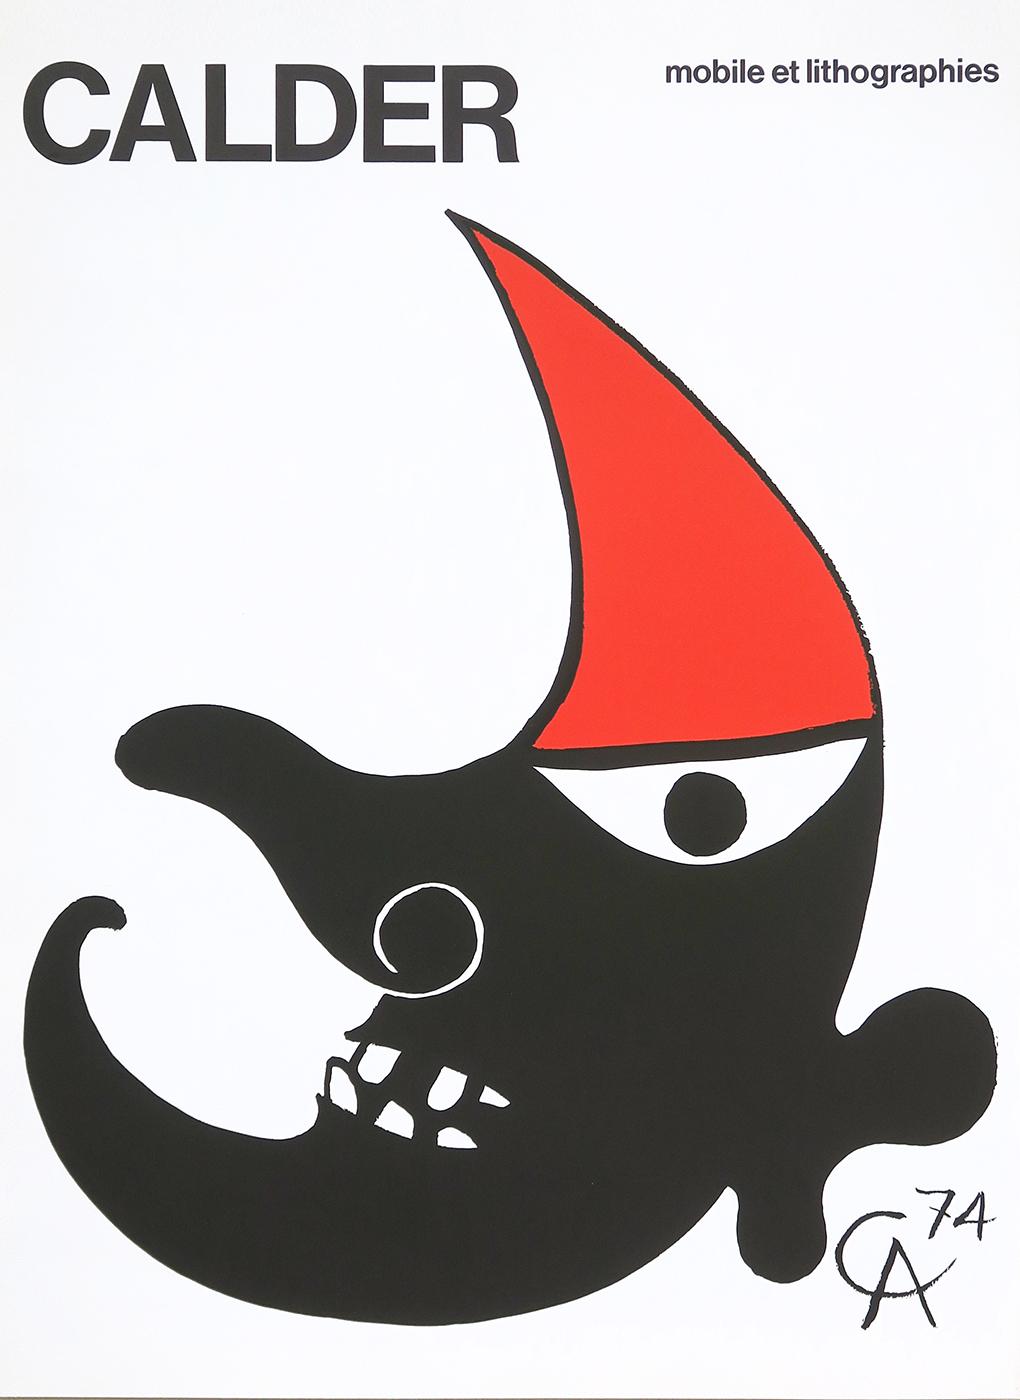 Alexander Calder, Poster Lithograph, C.N.A.C, Maeght publisher